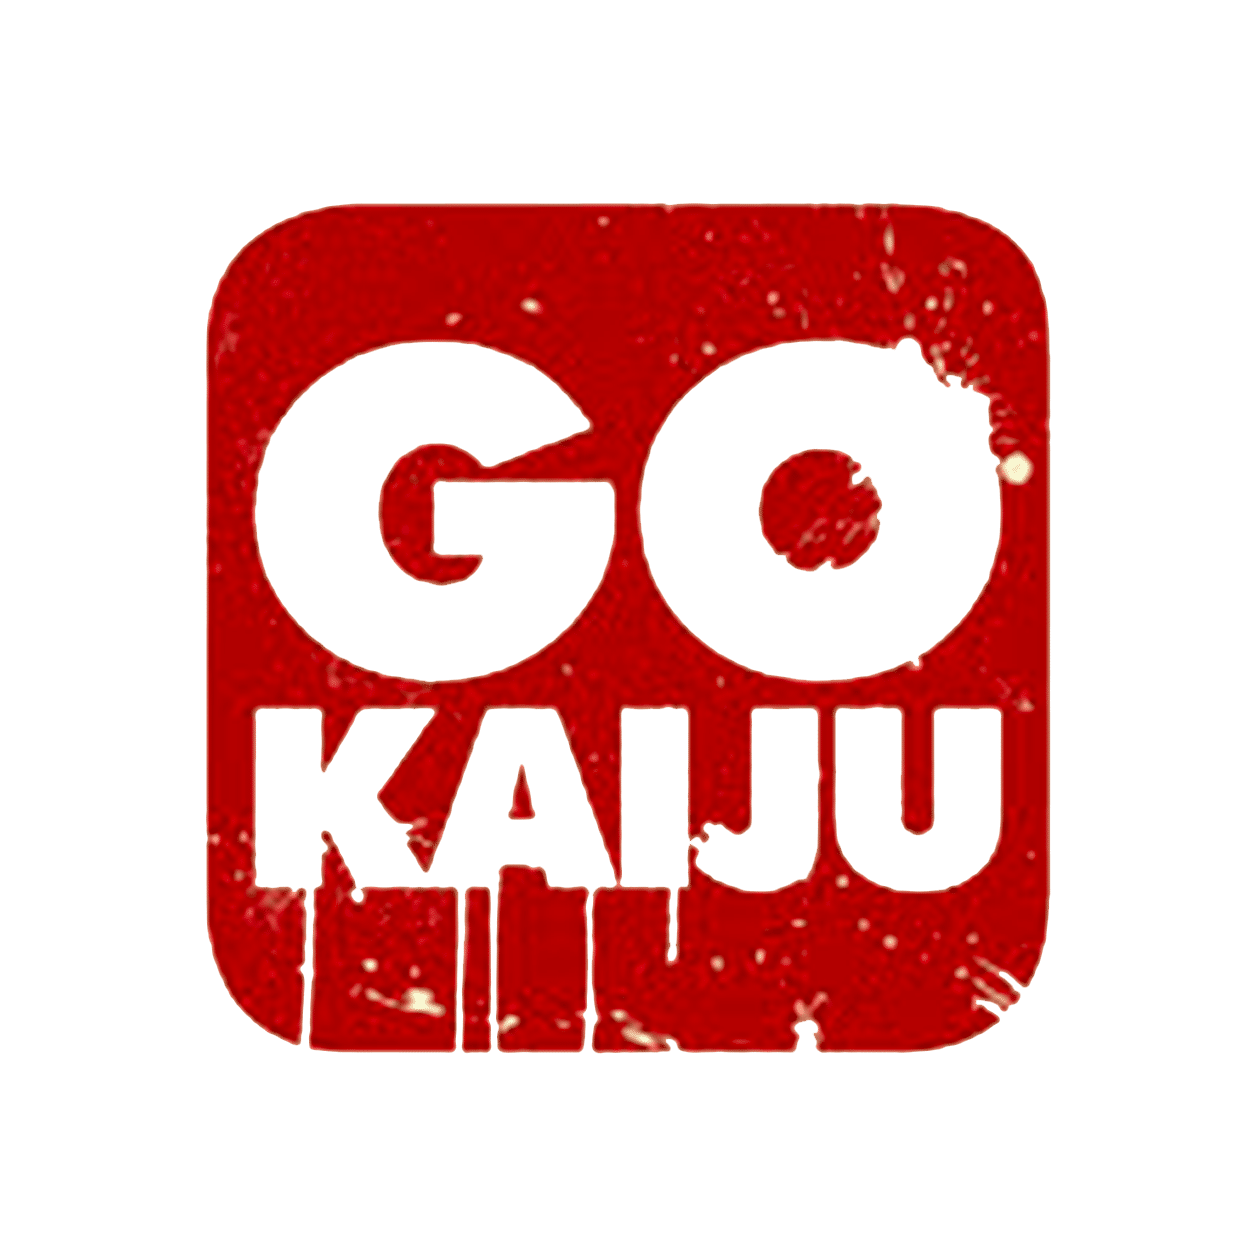 Logo Gokaiju